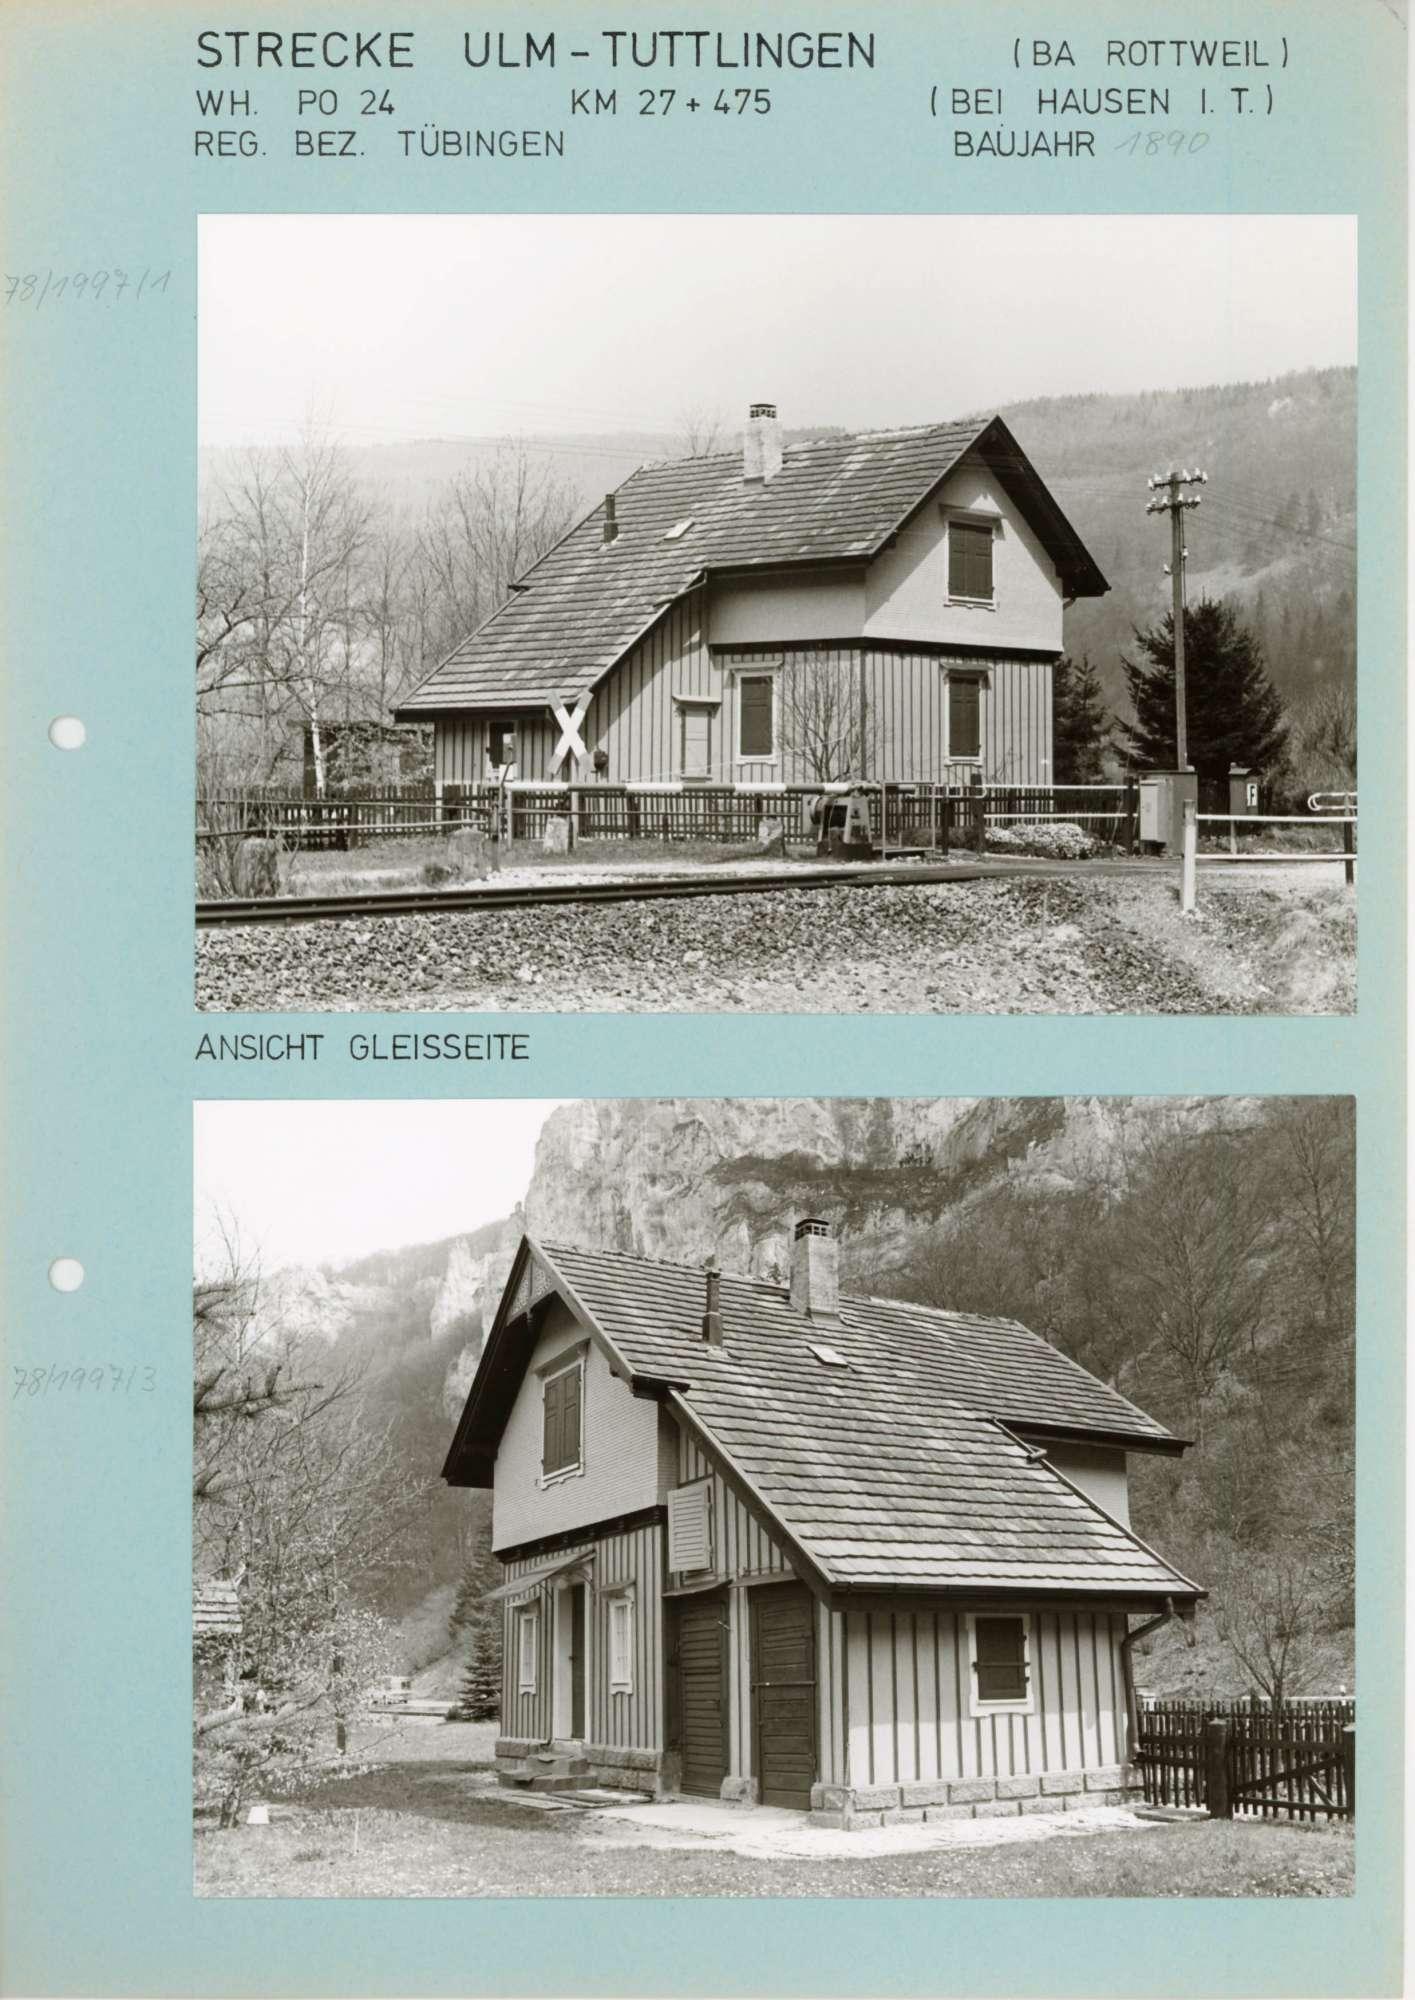 Hausen im Tal: 4 Fotos u.a., Bild 1